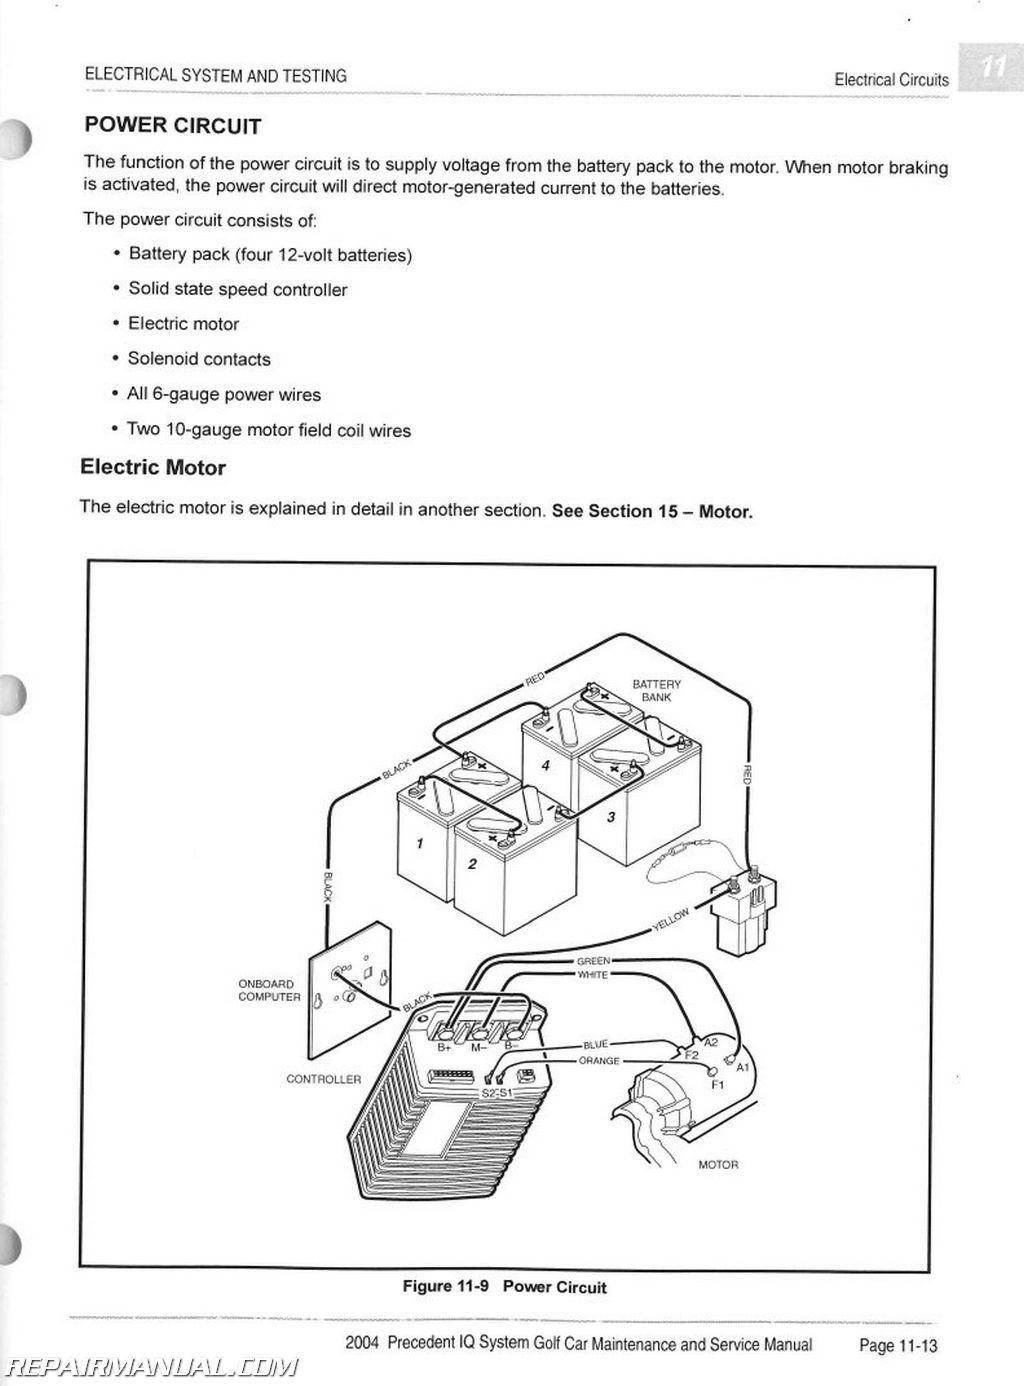 Club Car Precedent Battery Diagram | Manual E-Books - 2008 Club Car Precedent Wiring Diagram